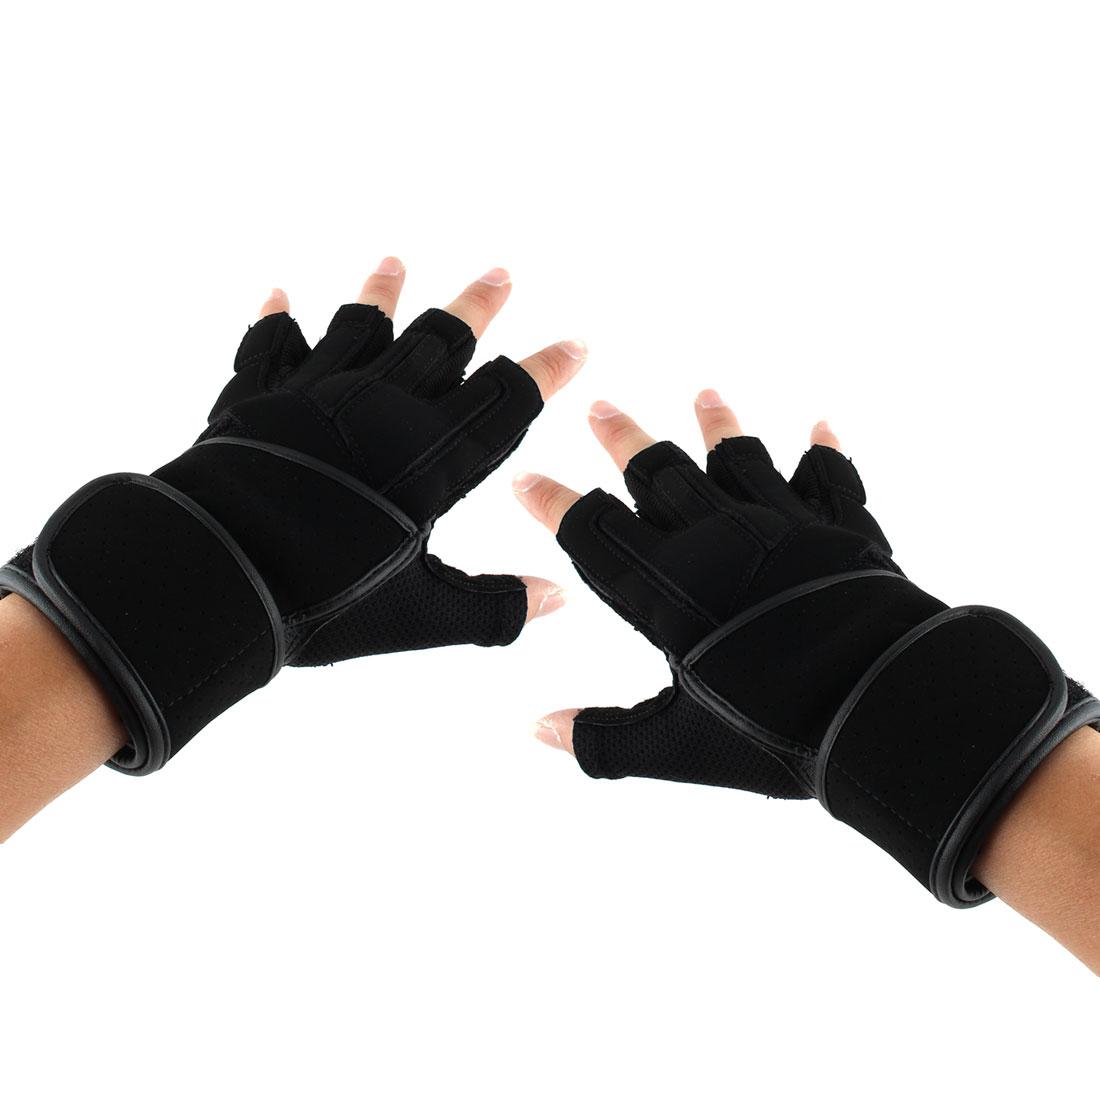 BOODUN Authorized Men PU Leather Adjustable Sports Training Workout Half Finger Fitness Gloves Black M Pair